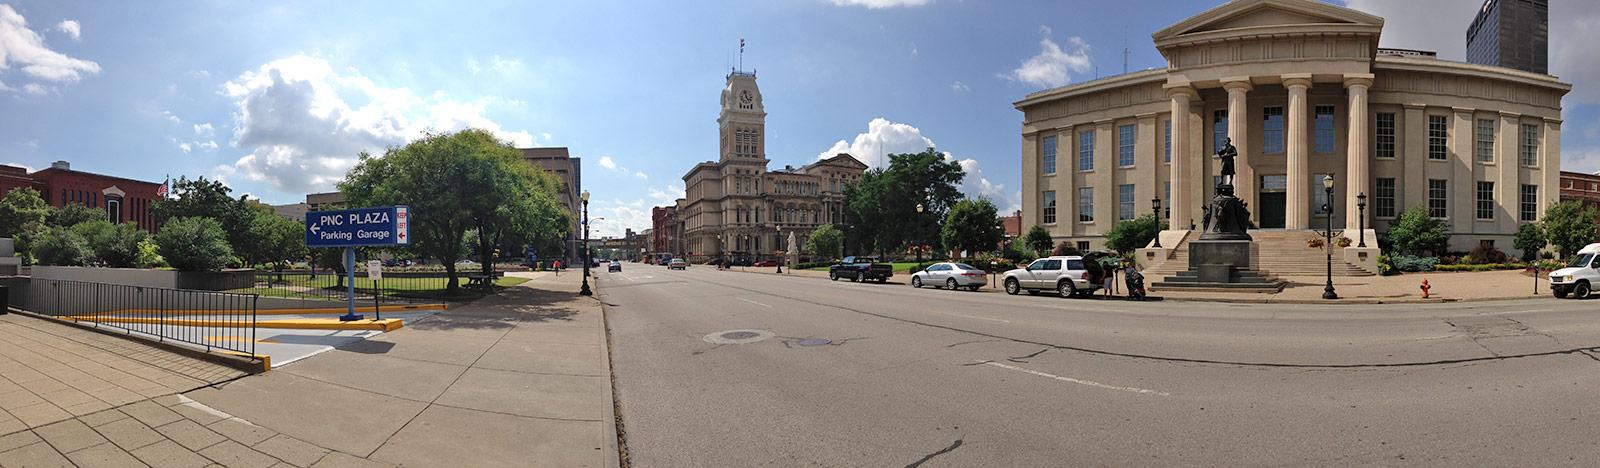 Government buildings surrounding Jefferson Square. (Broken Sidewalk)